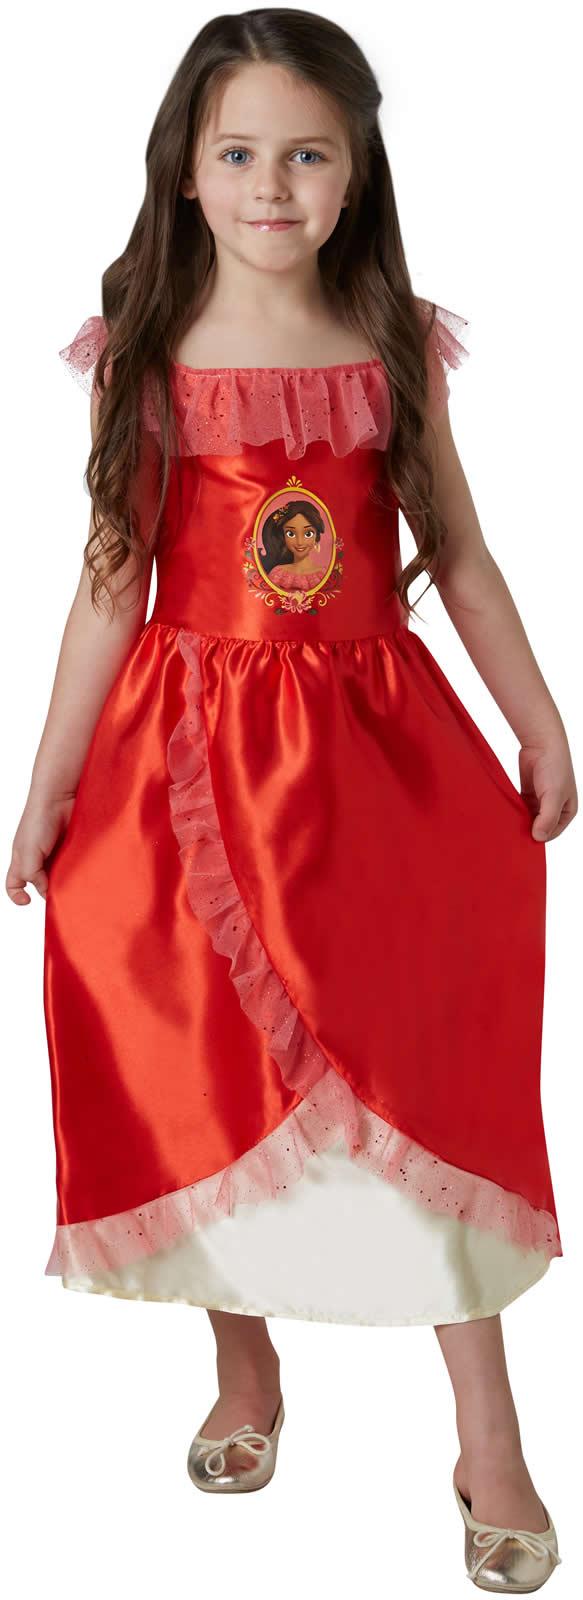 Elena von Avalor Disney Latina Prinzessin Kinder Karneval Kostüm 104 ...